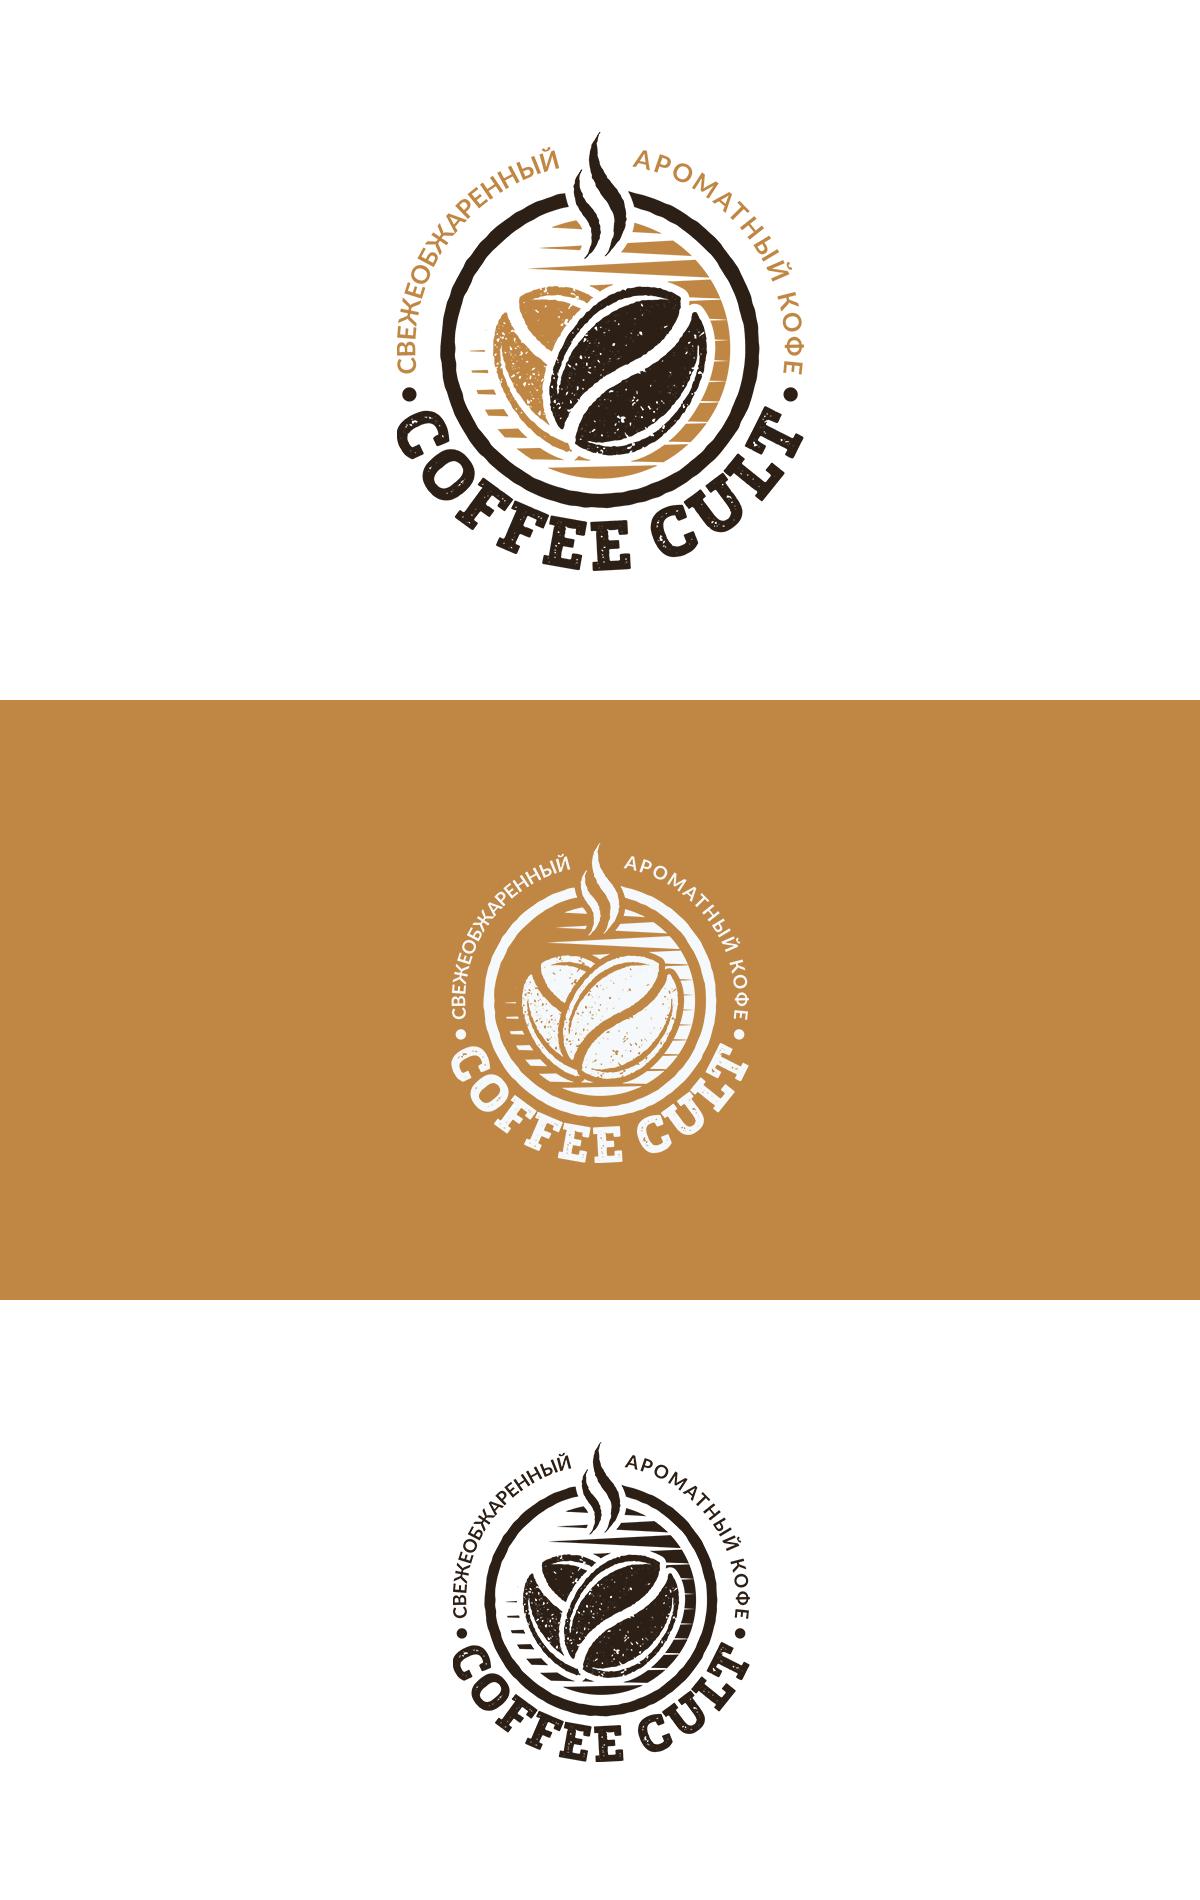 Логотип и фирменный стиль для компании COFFEE CULT фото f_2835bc9a08933d3f.png